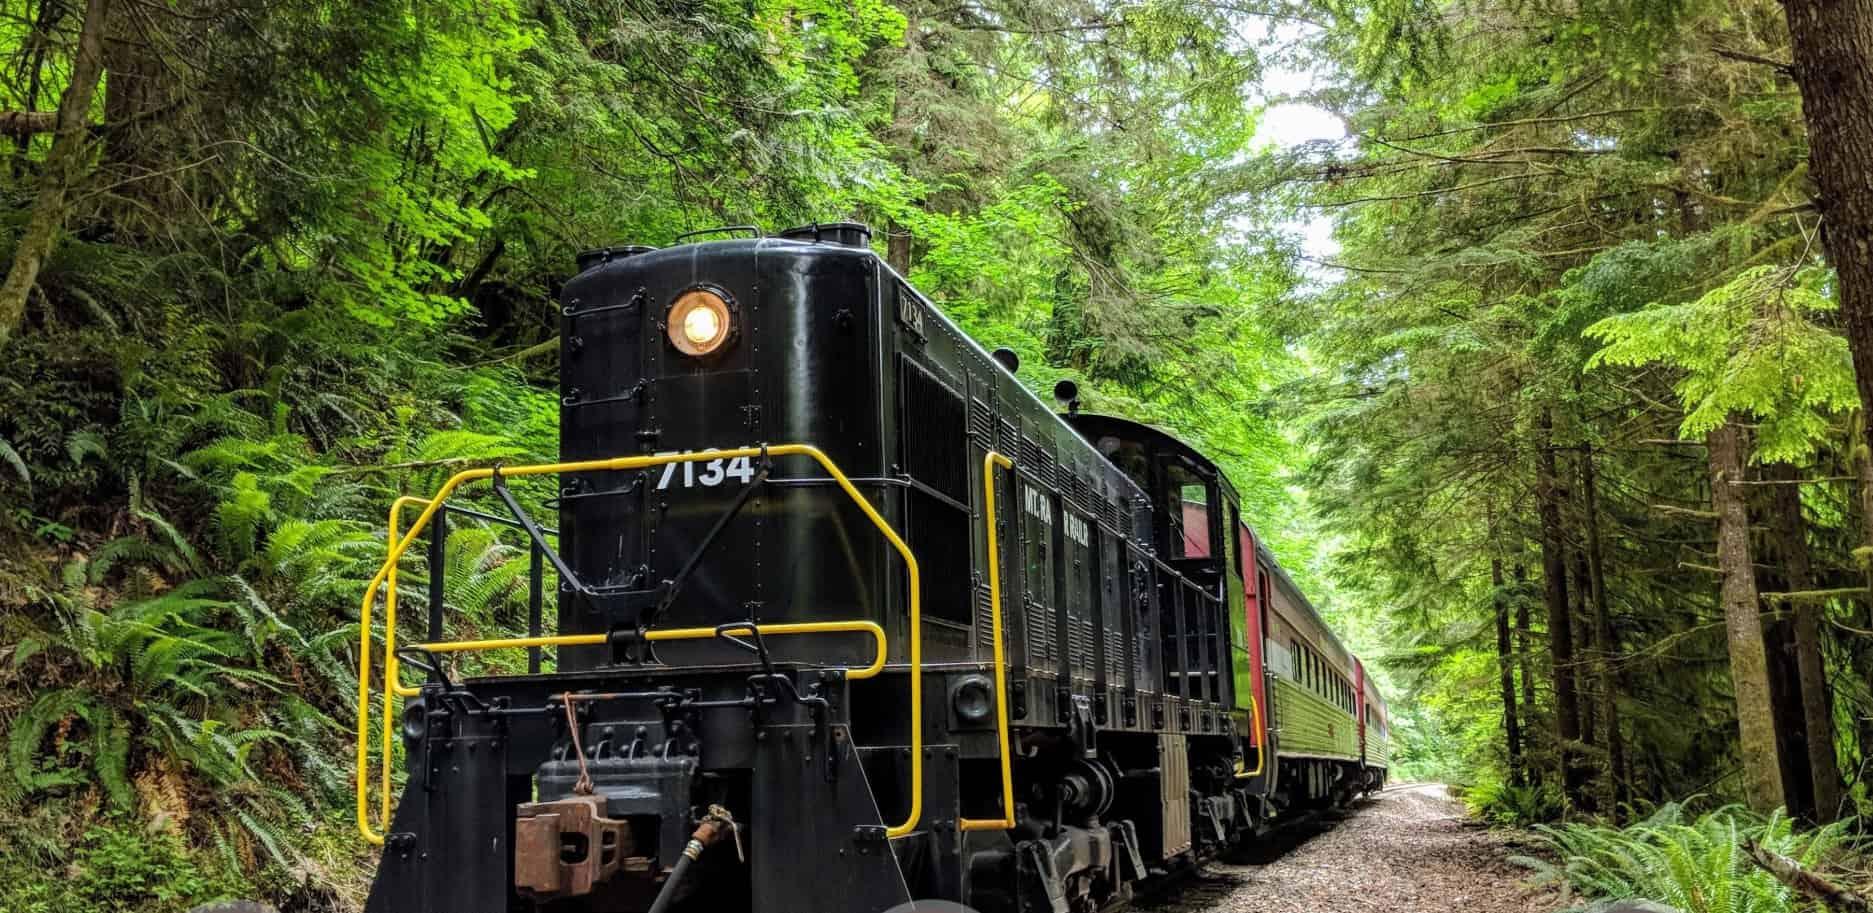 Mt Rainier Railroad Diesel Engine